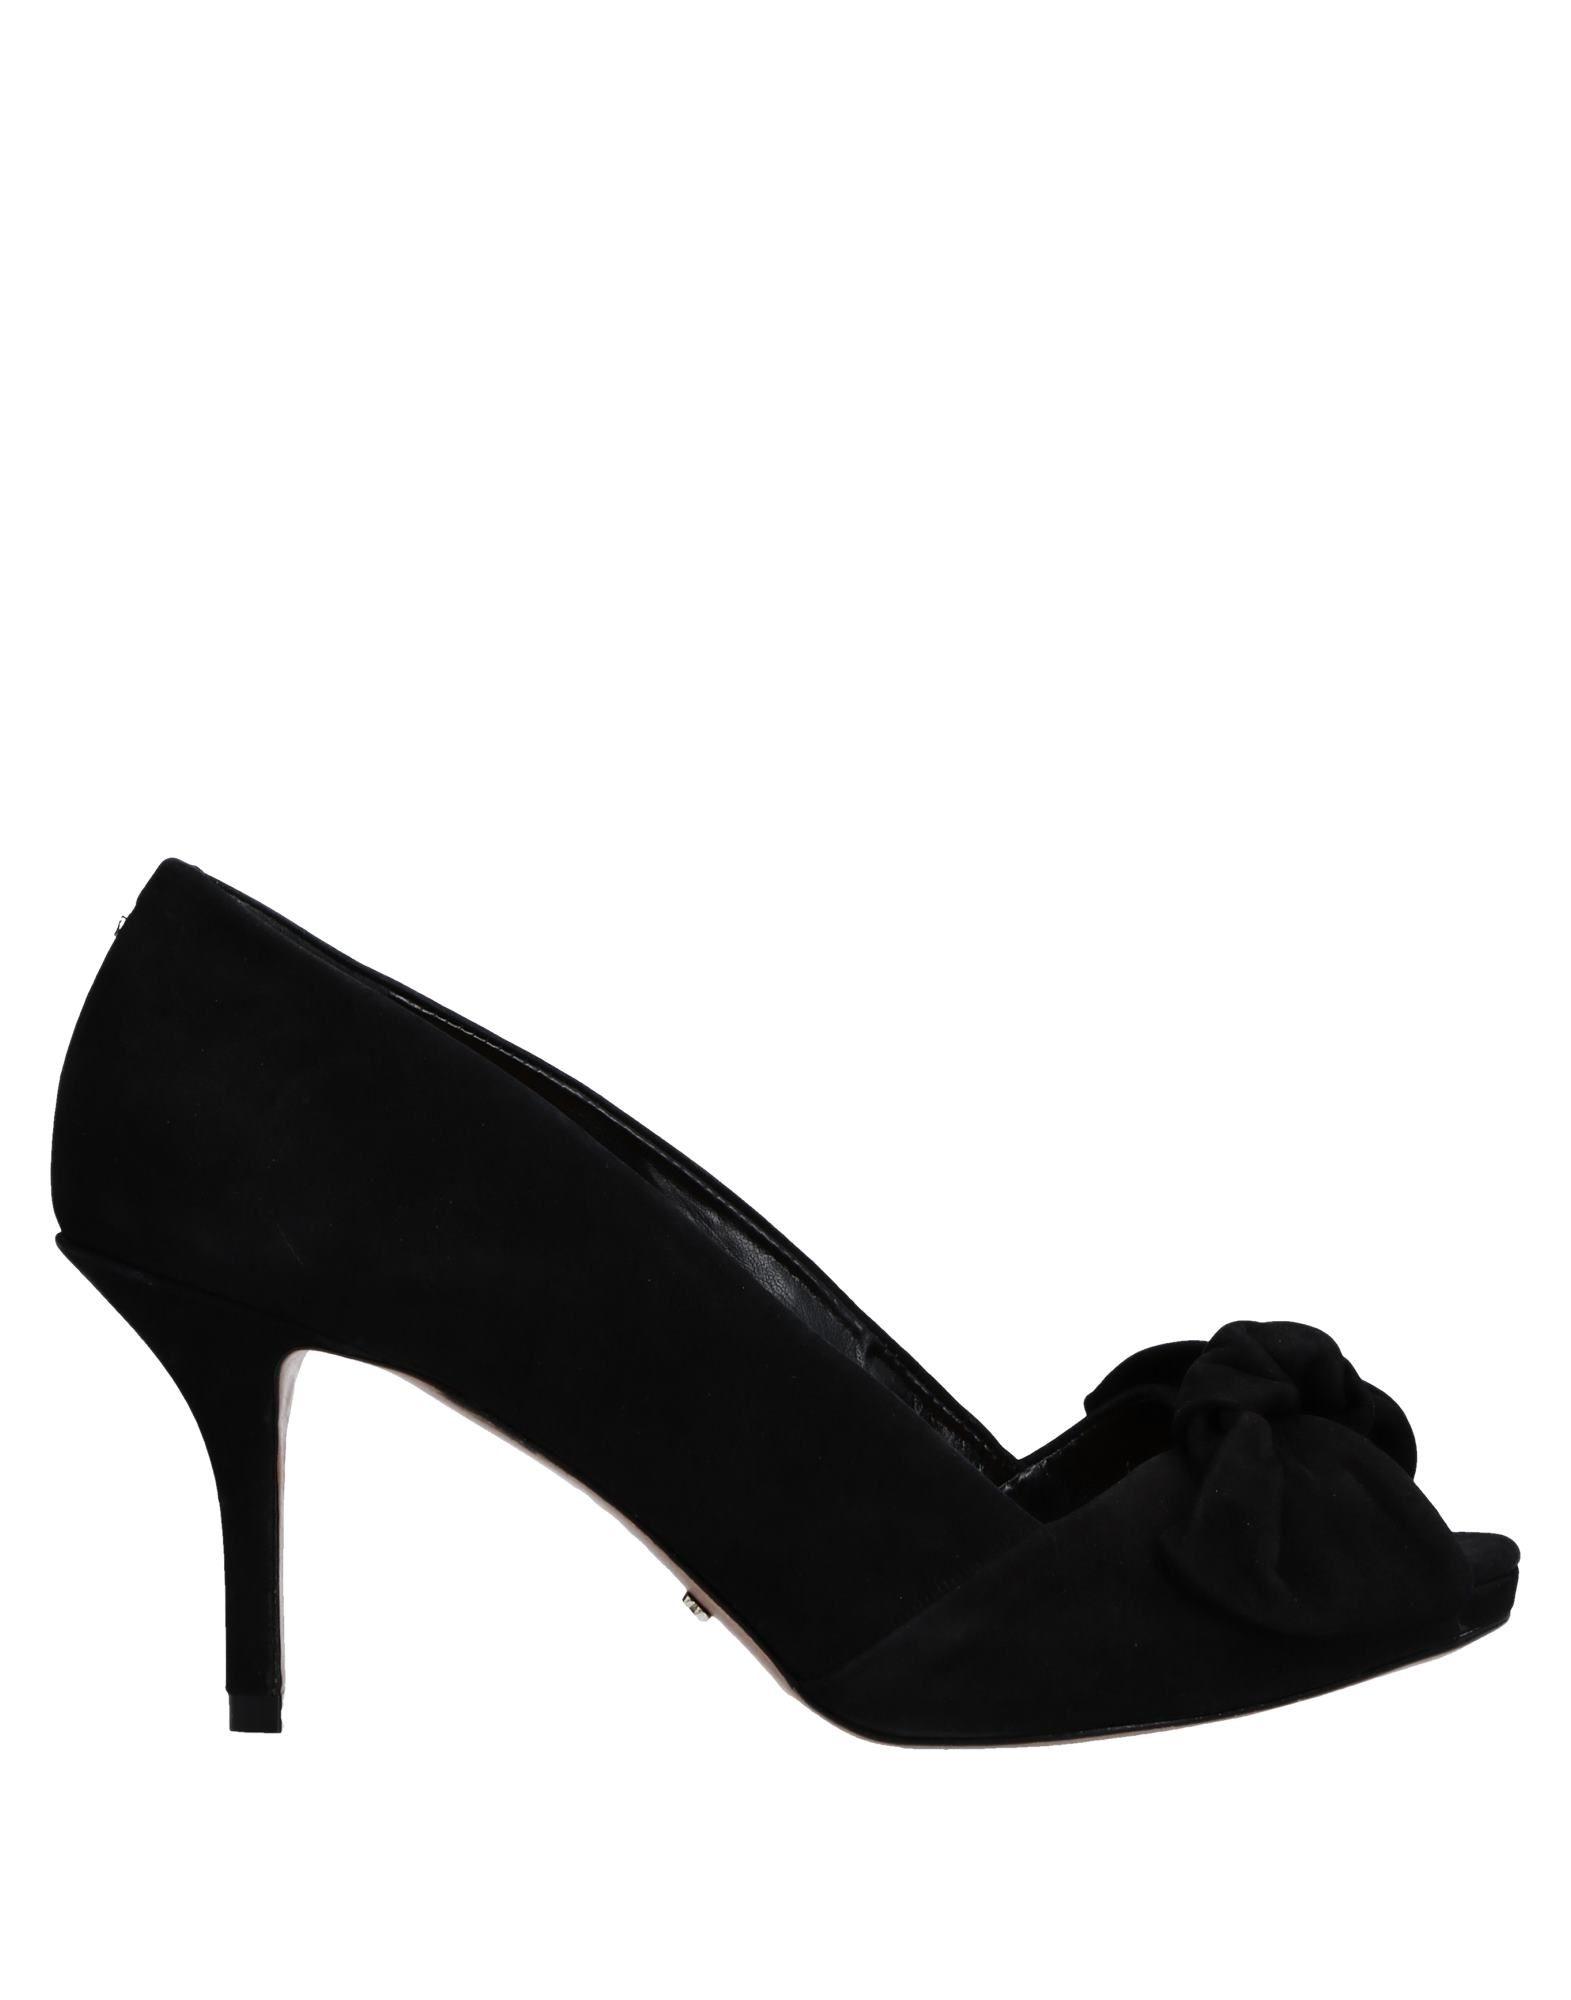 Gut um Pumps billige Schuhe zu tragenSchutz Pumps um Damen  11527400DH af3205